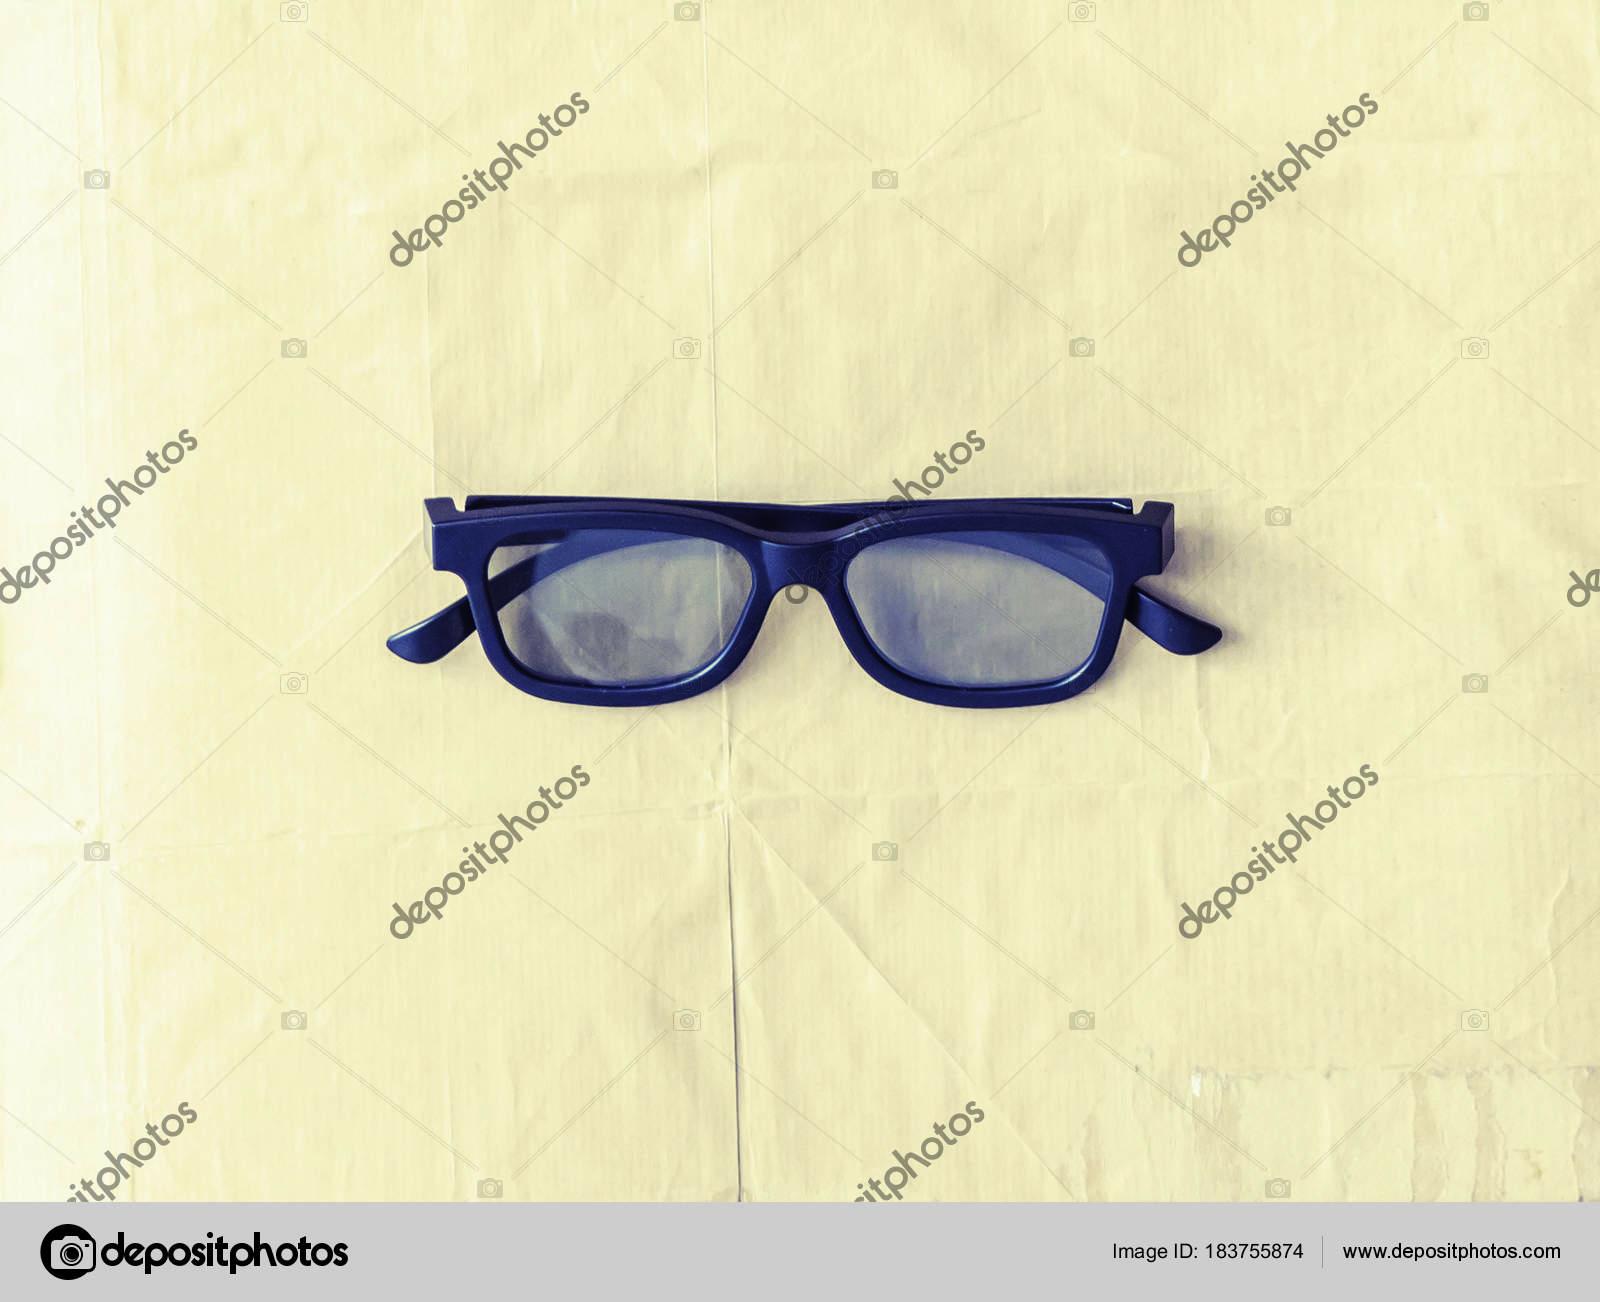 8ed9f879e3 Γυαλιά Ηλίου Μαύρο Και Λεύκωμα Πέρα Από Vintage Ξύλινο Υπόβαθρο — Φωτογραφία  Αρχείου